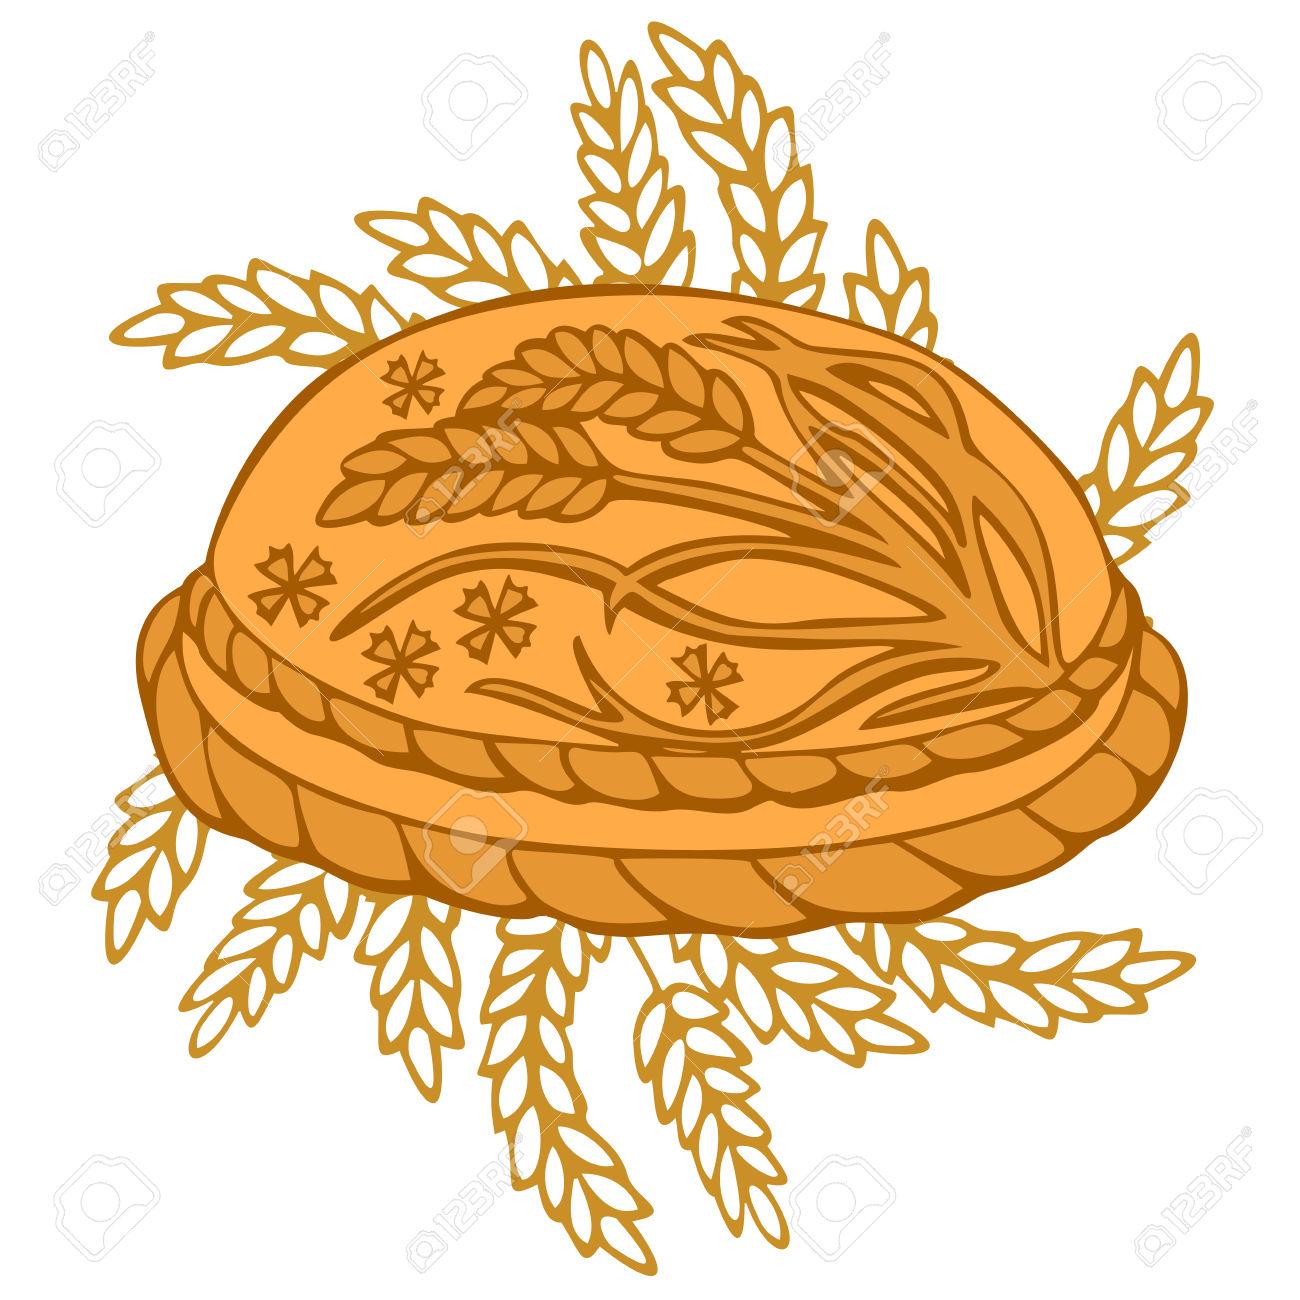 Round Loaf Karavai, Traditional Slavic Russian And Ukrainian.